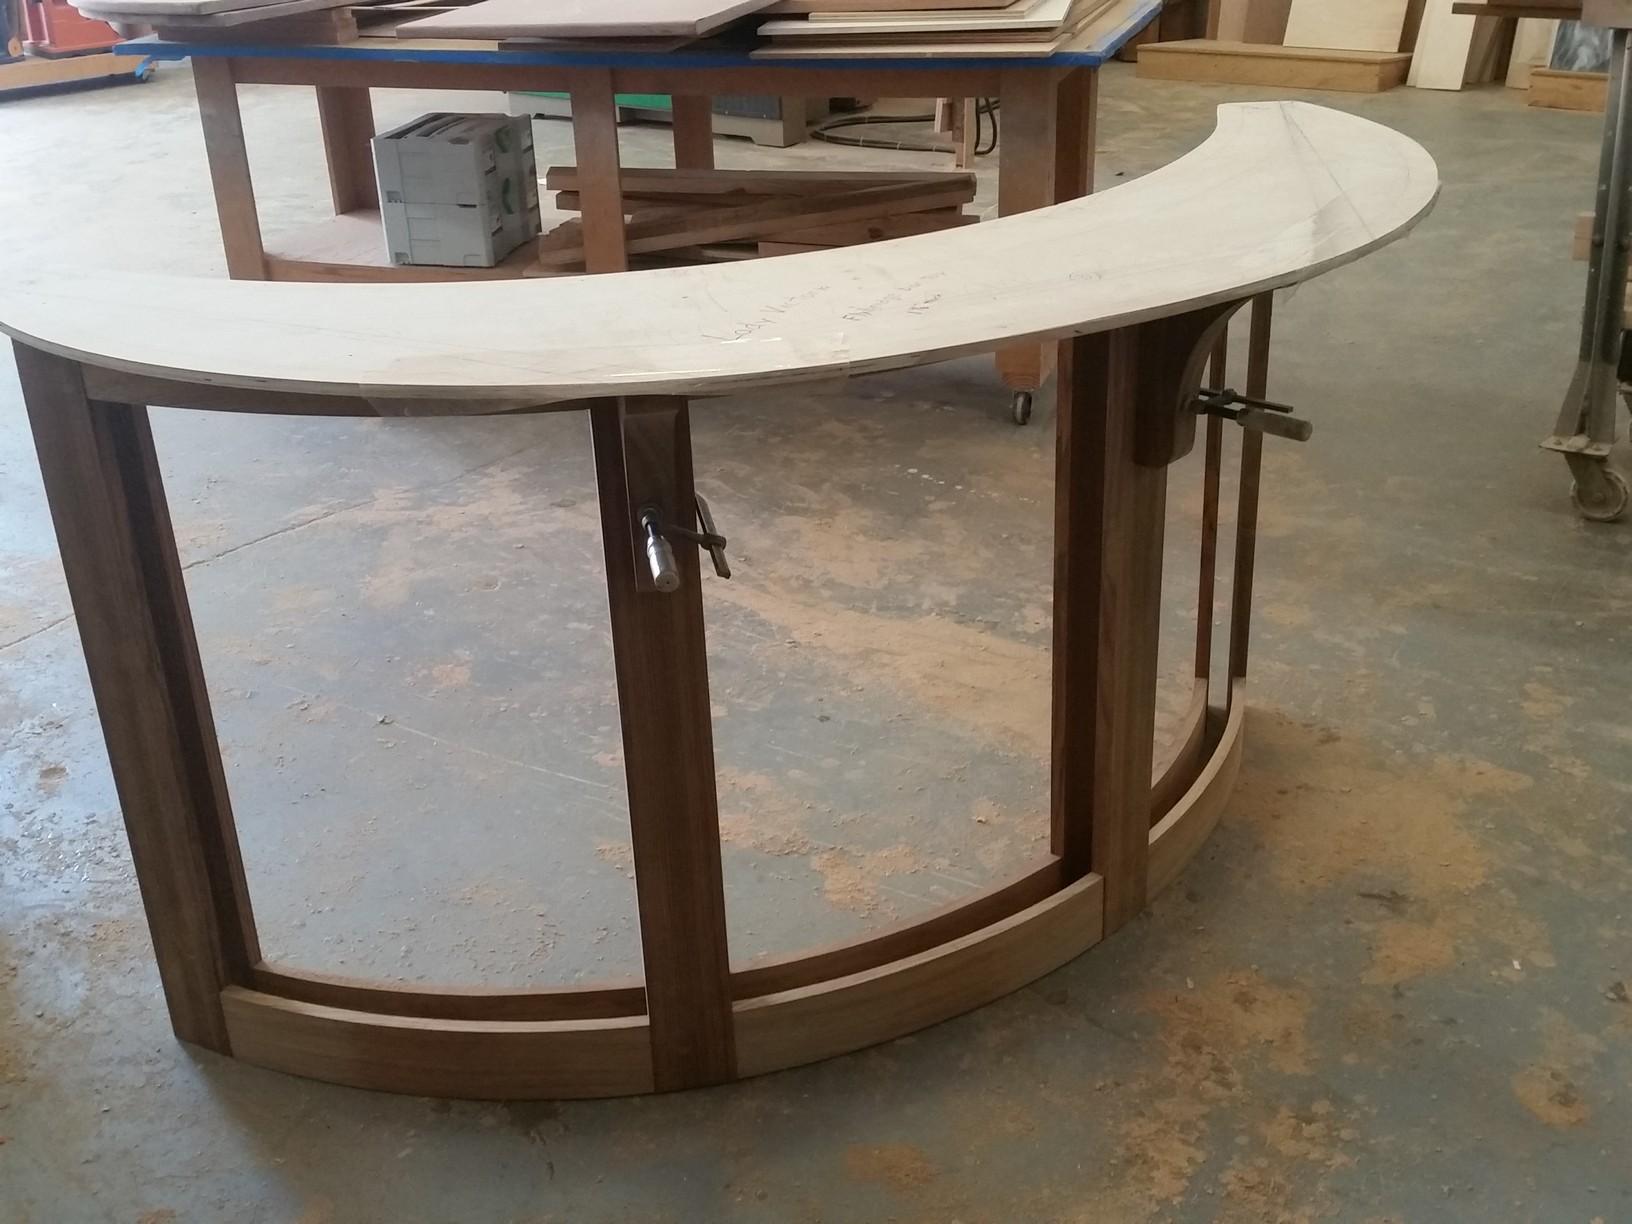 Curved Teak Bar Build - Finish Carpentry - Contractor Talk